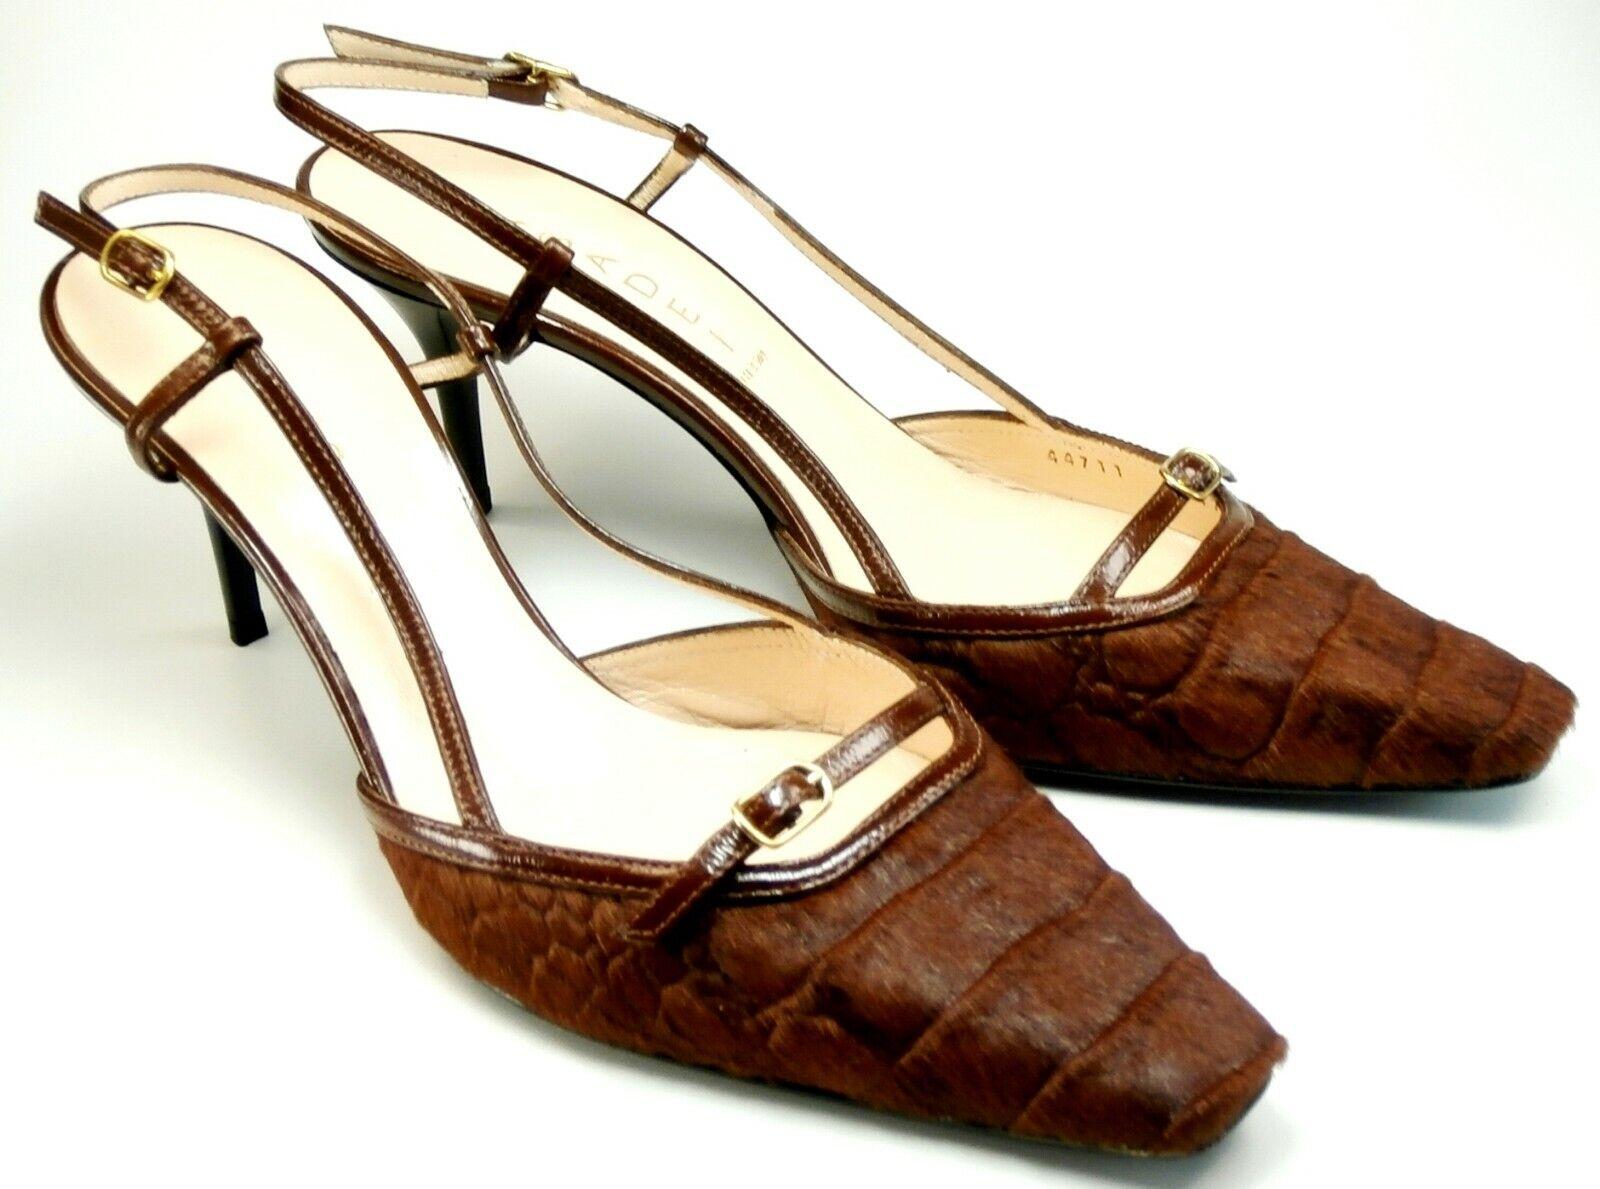 CASADEI Sandaletten Gr. 39 braun Fell Kroko Retro Damen Schuhe Slingbacks Pumps